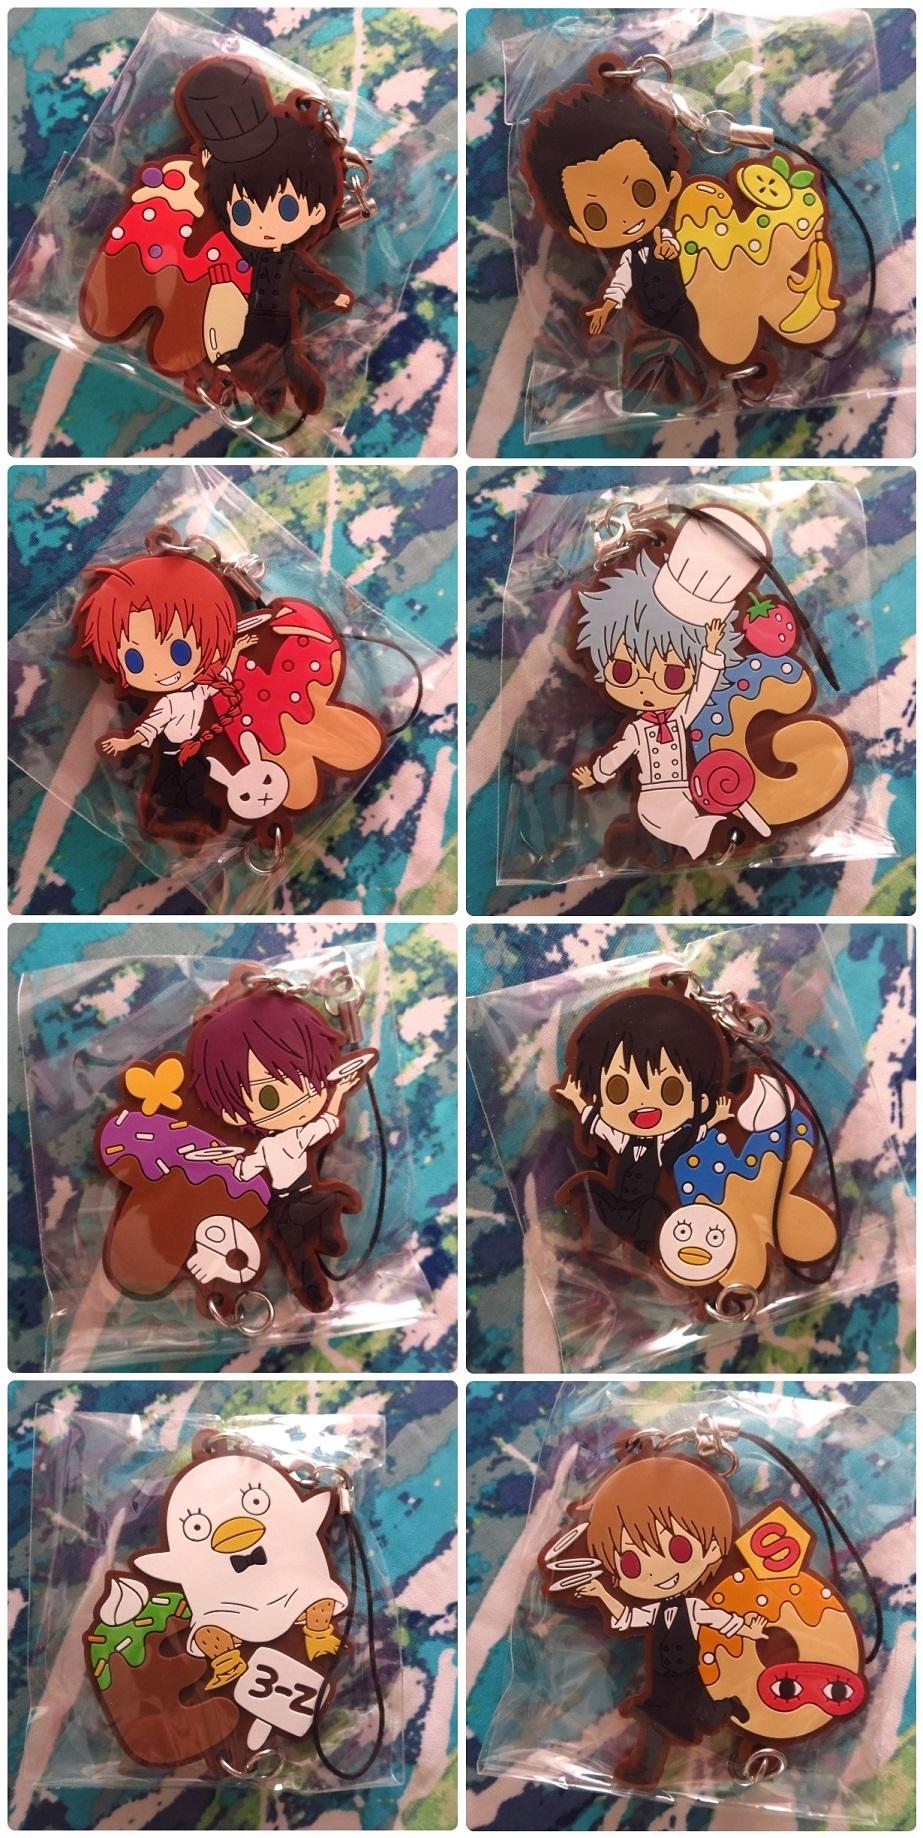 Japan Anime Gintama Gintoki Kamui Manga Okita  Keychain Rubber Strap Phone Charm